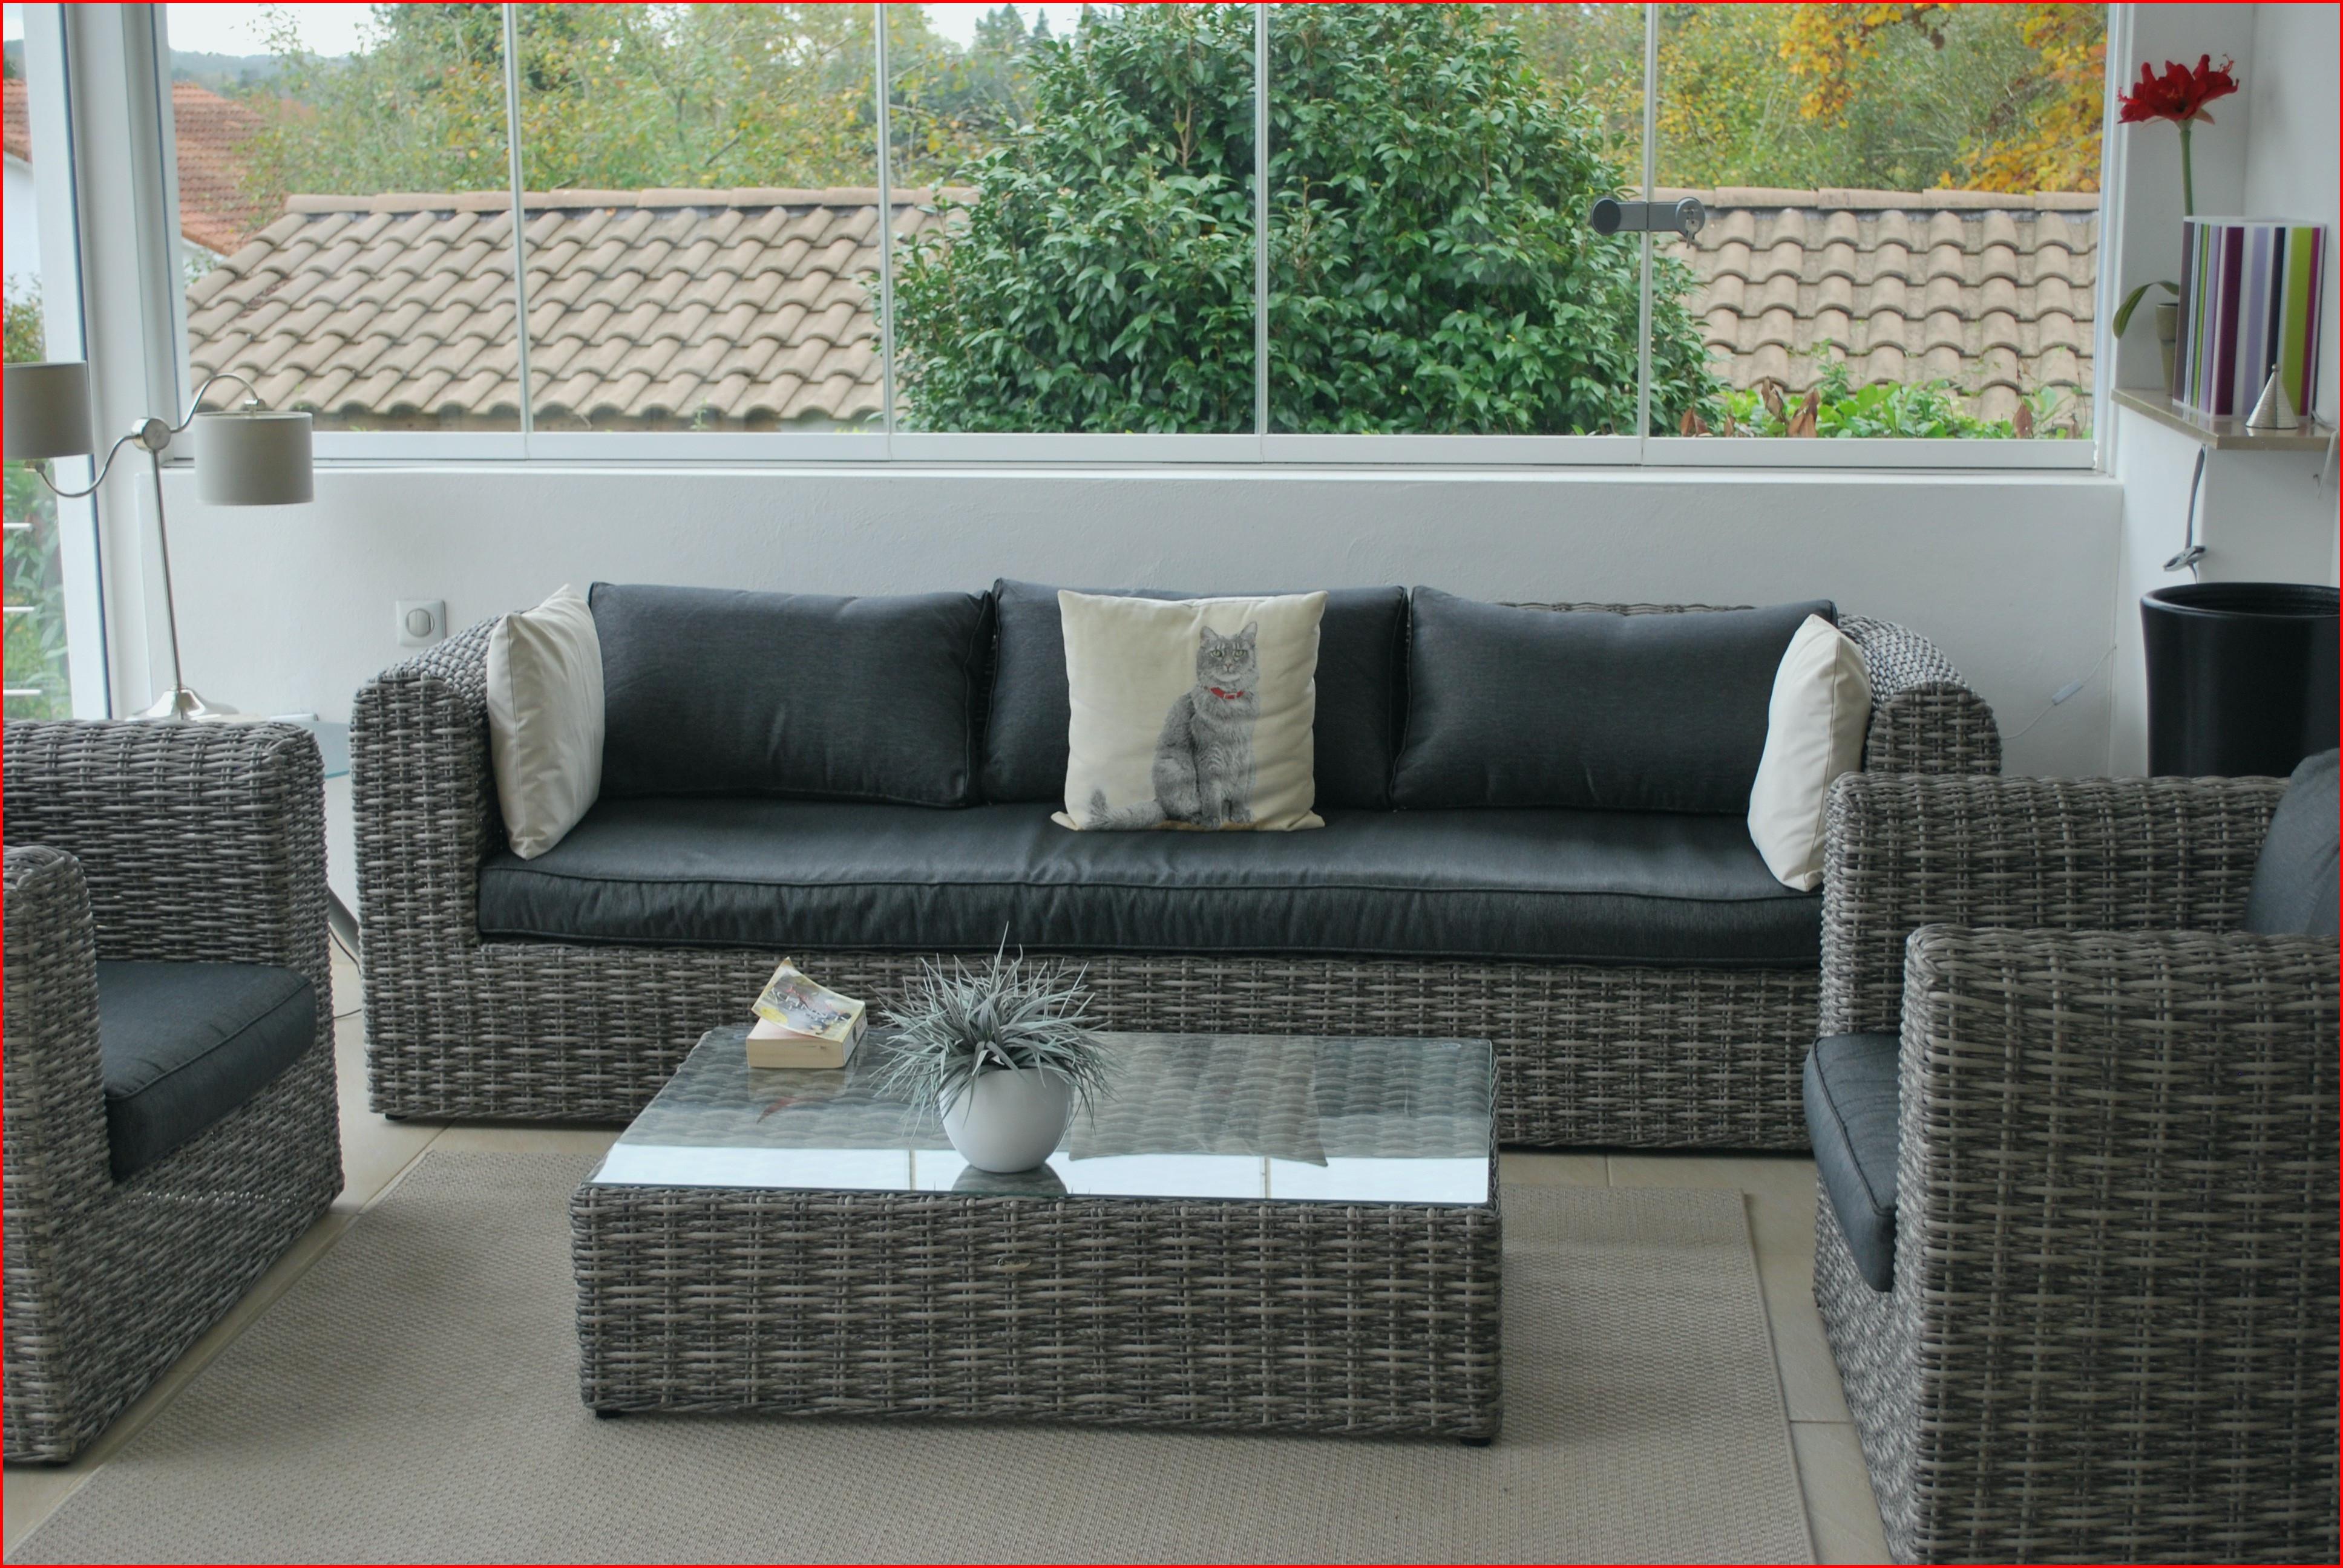 Salon jardin exterieur resine tressee - Mailleraye.fr jardin